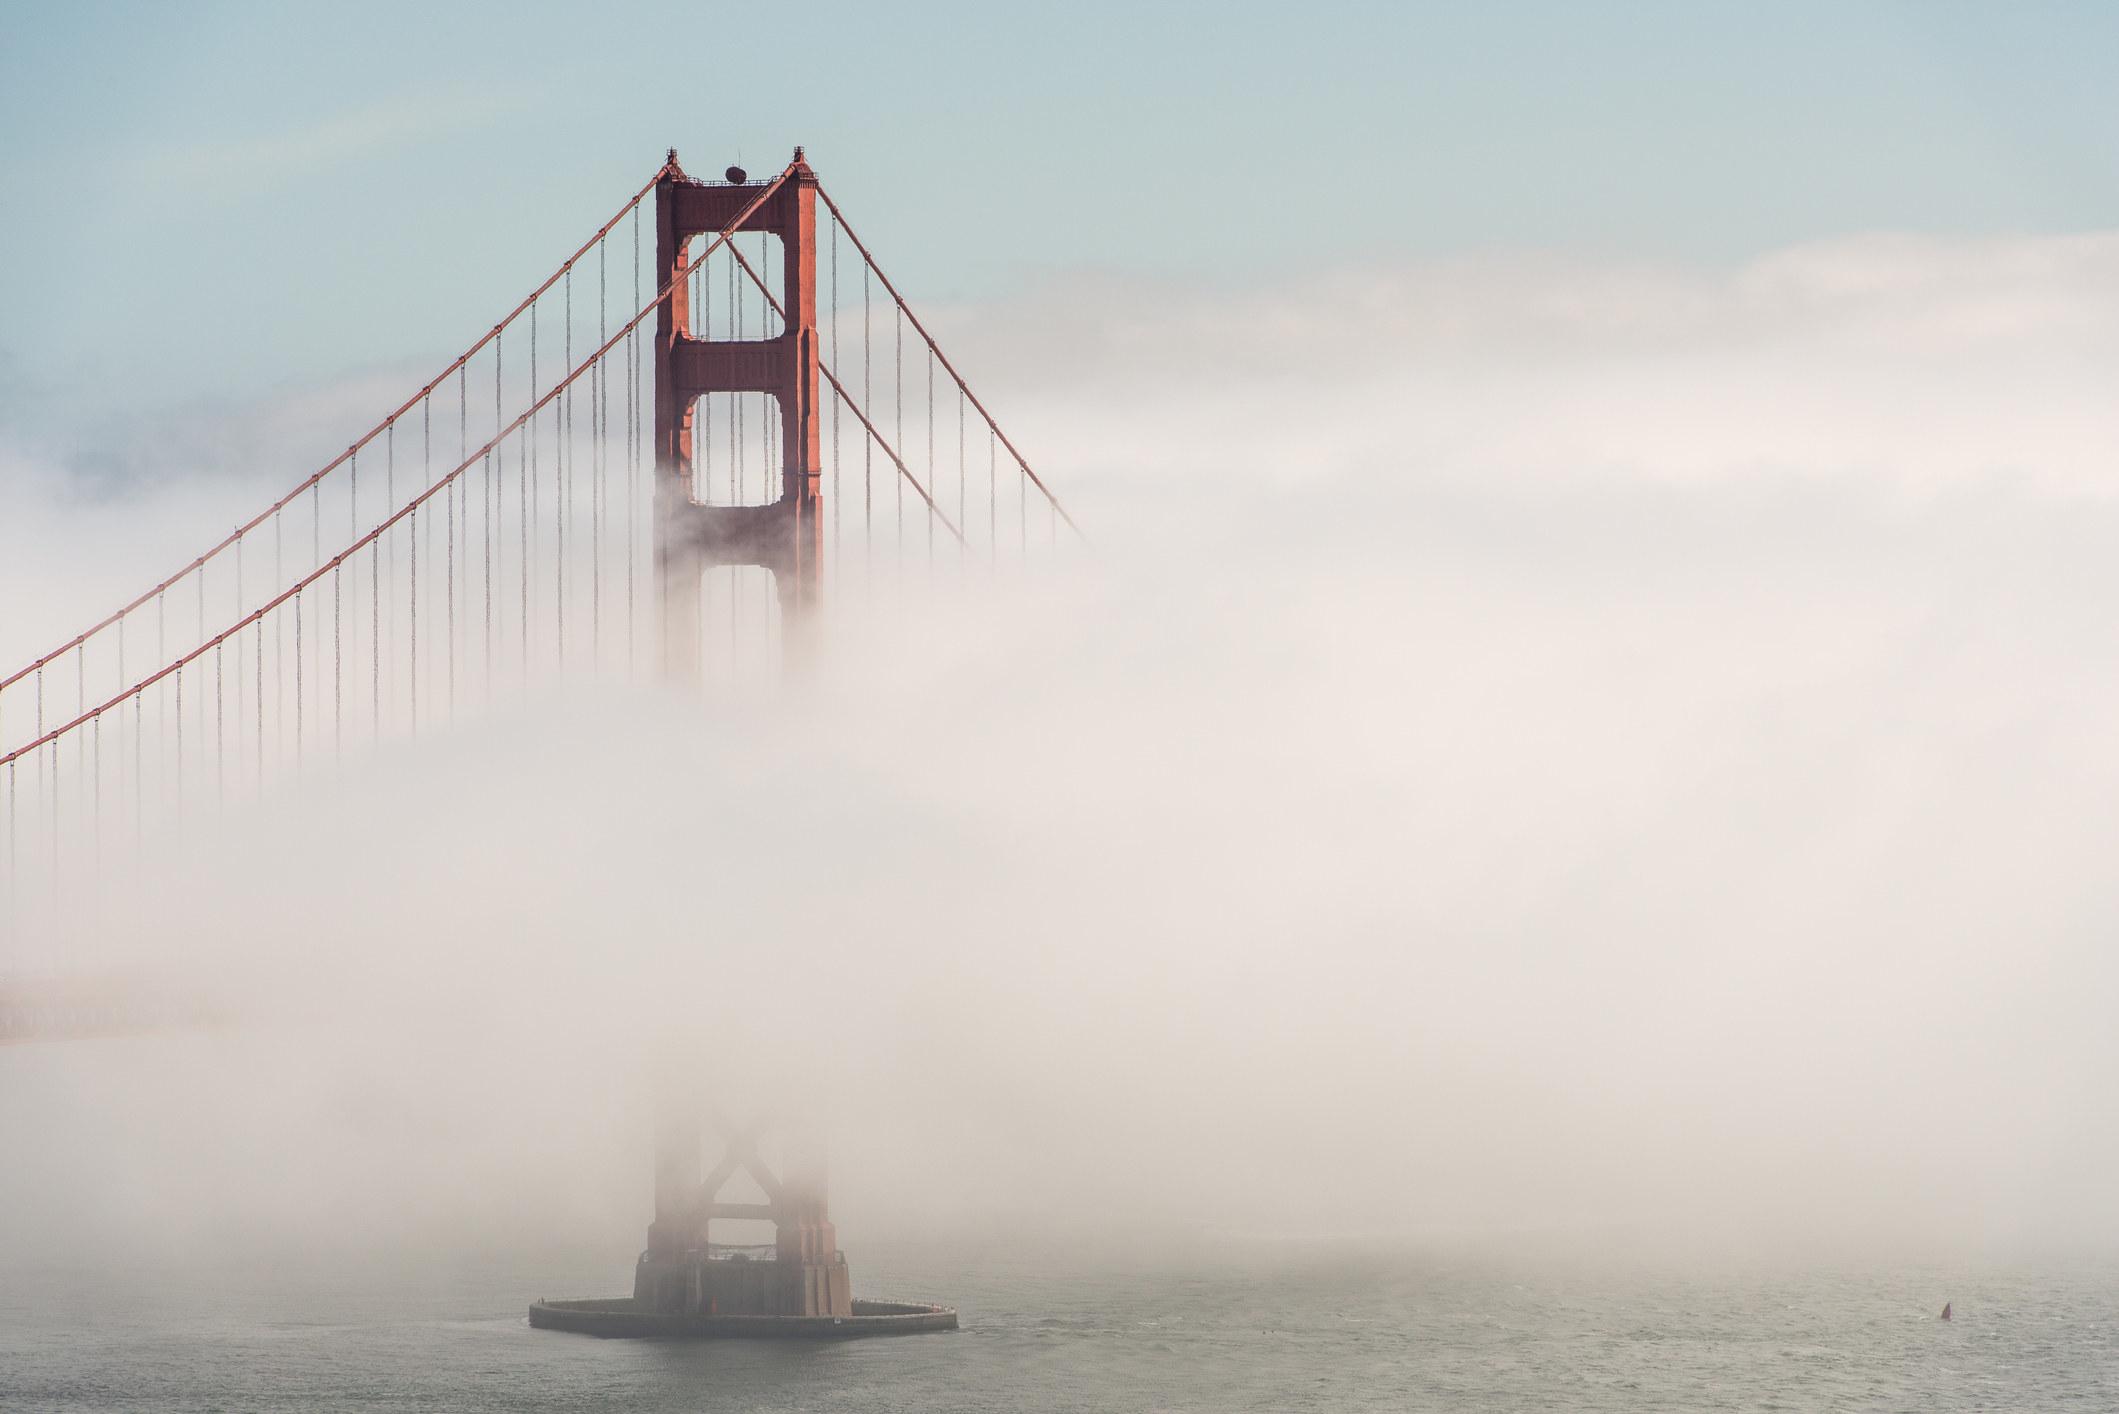 Fog surrounding the Golden Gate Bridge.